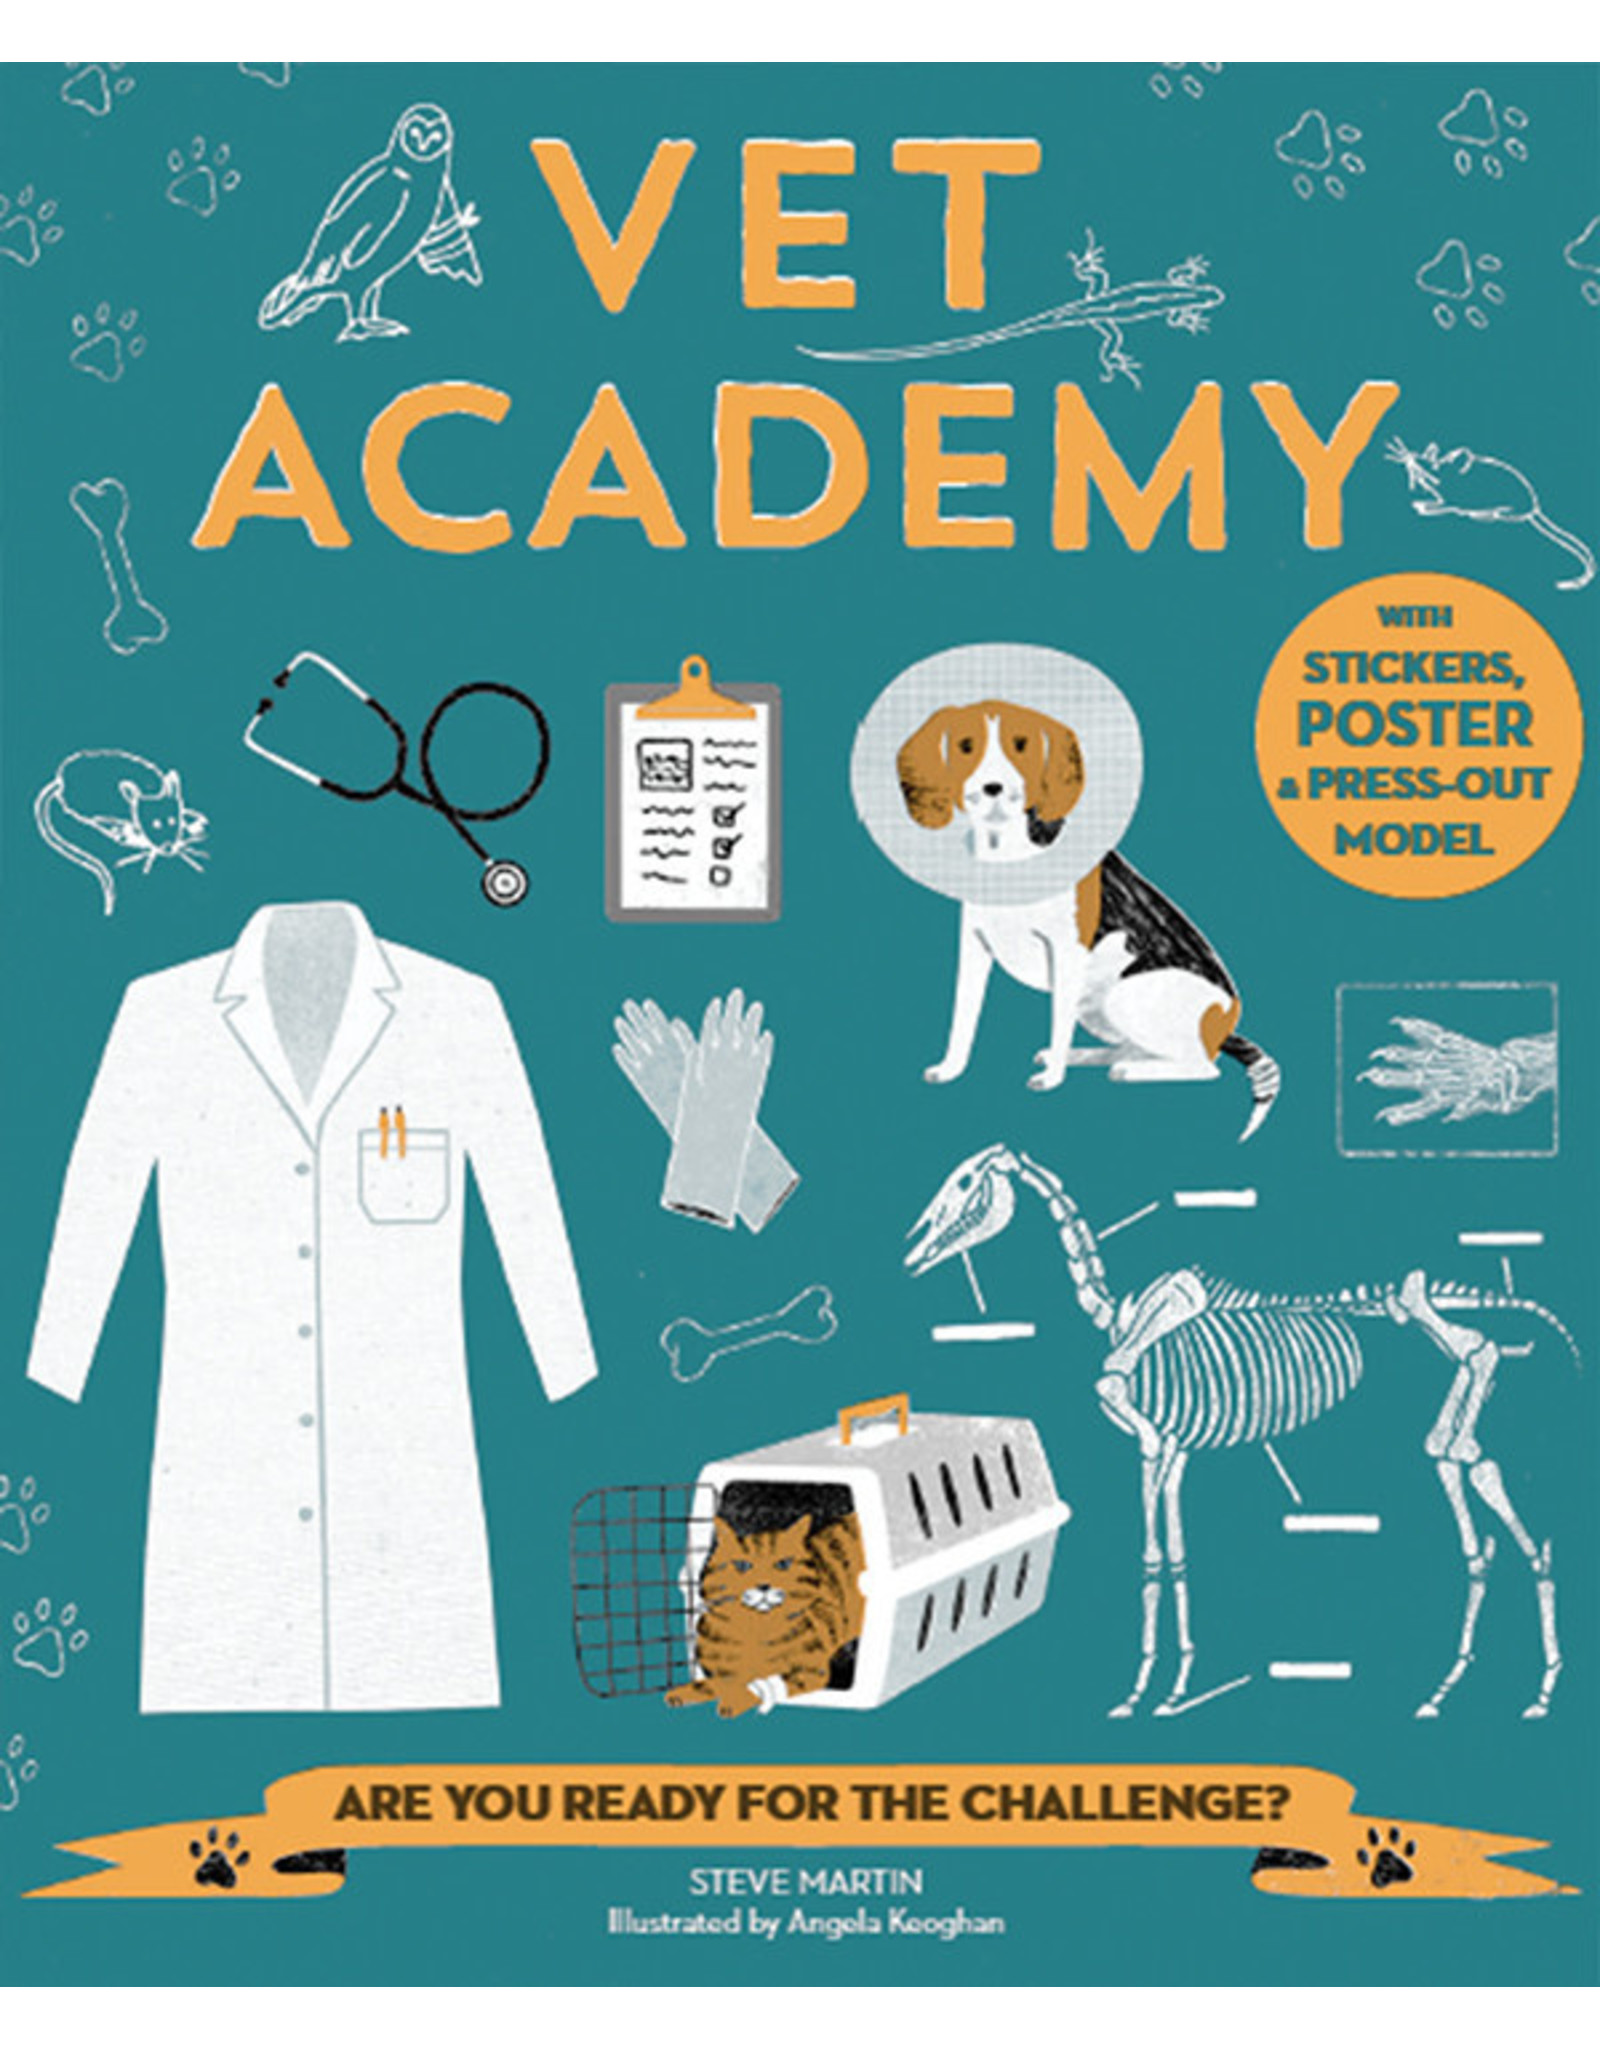 Usborne & Kane Miller Books Academy, Vet Academy